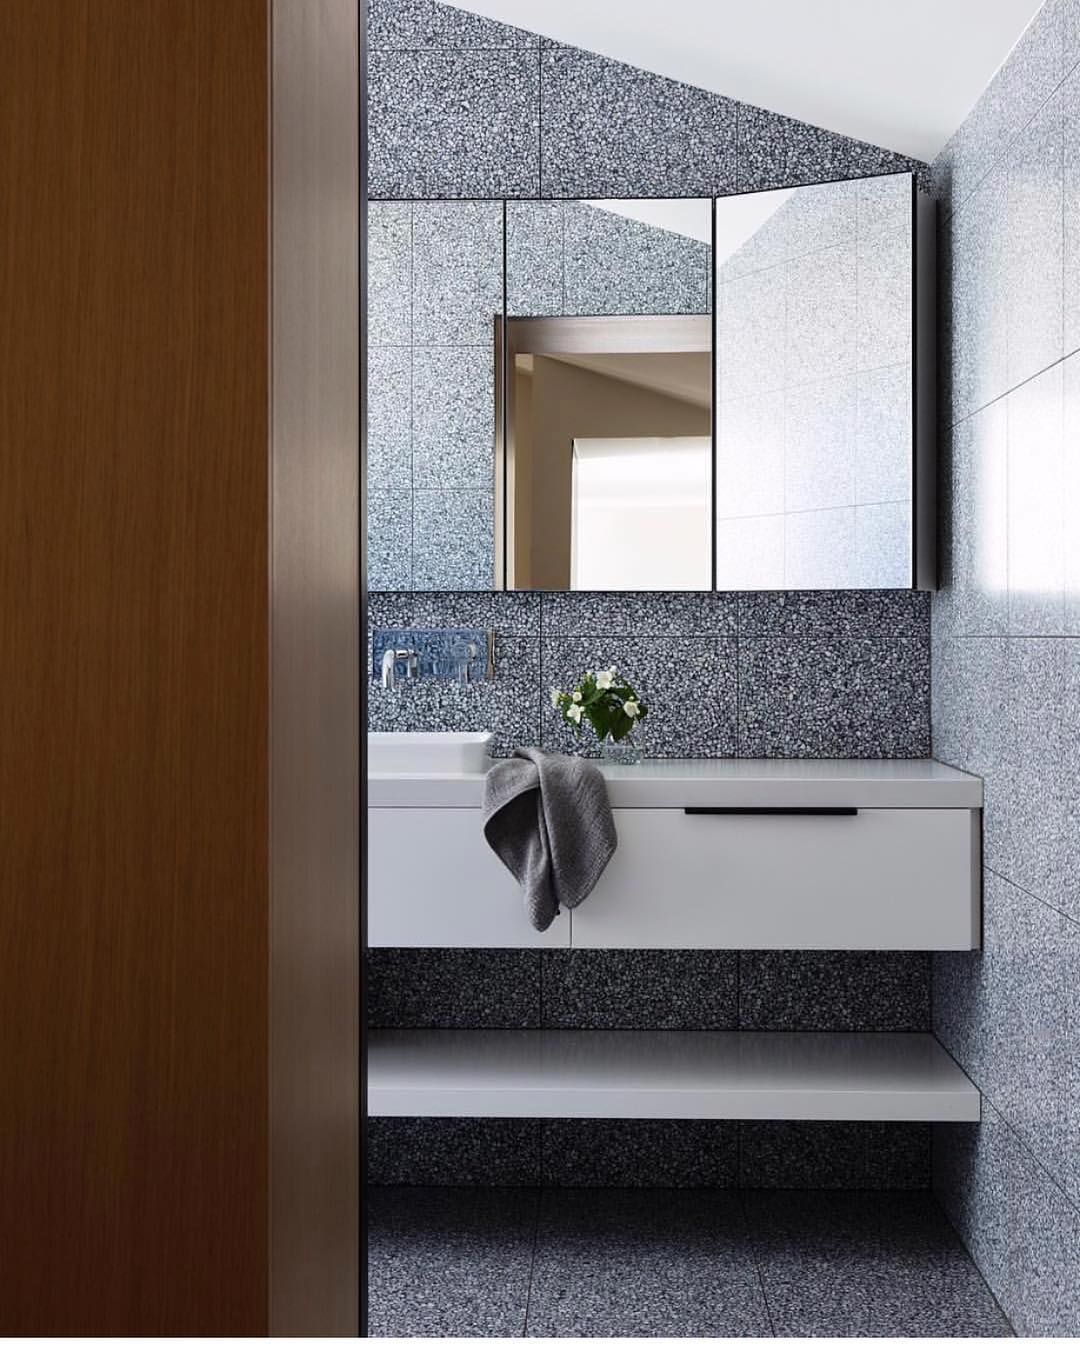 Port Melbourne Project / Pandolfini Architects